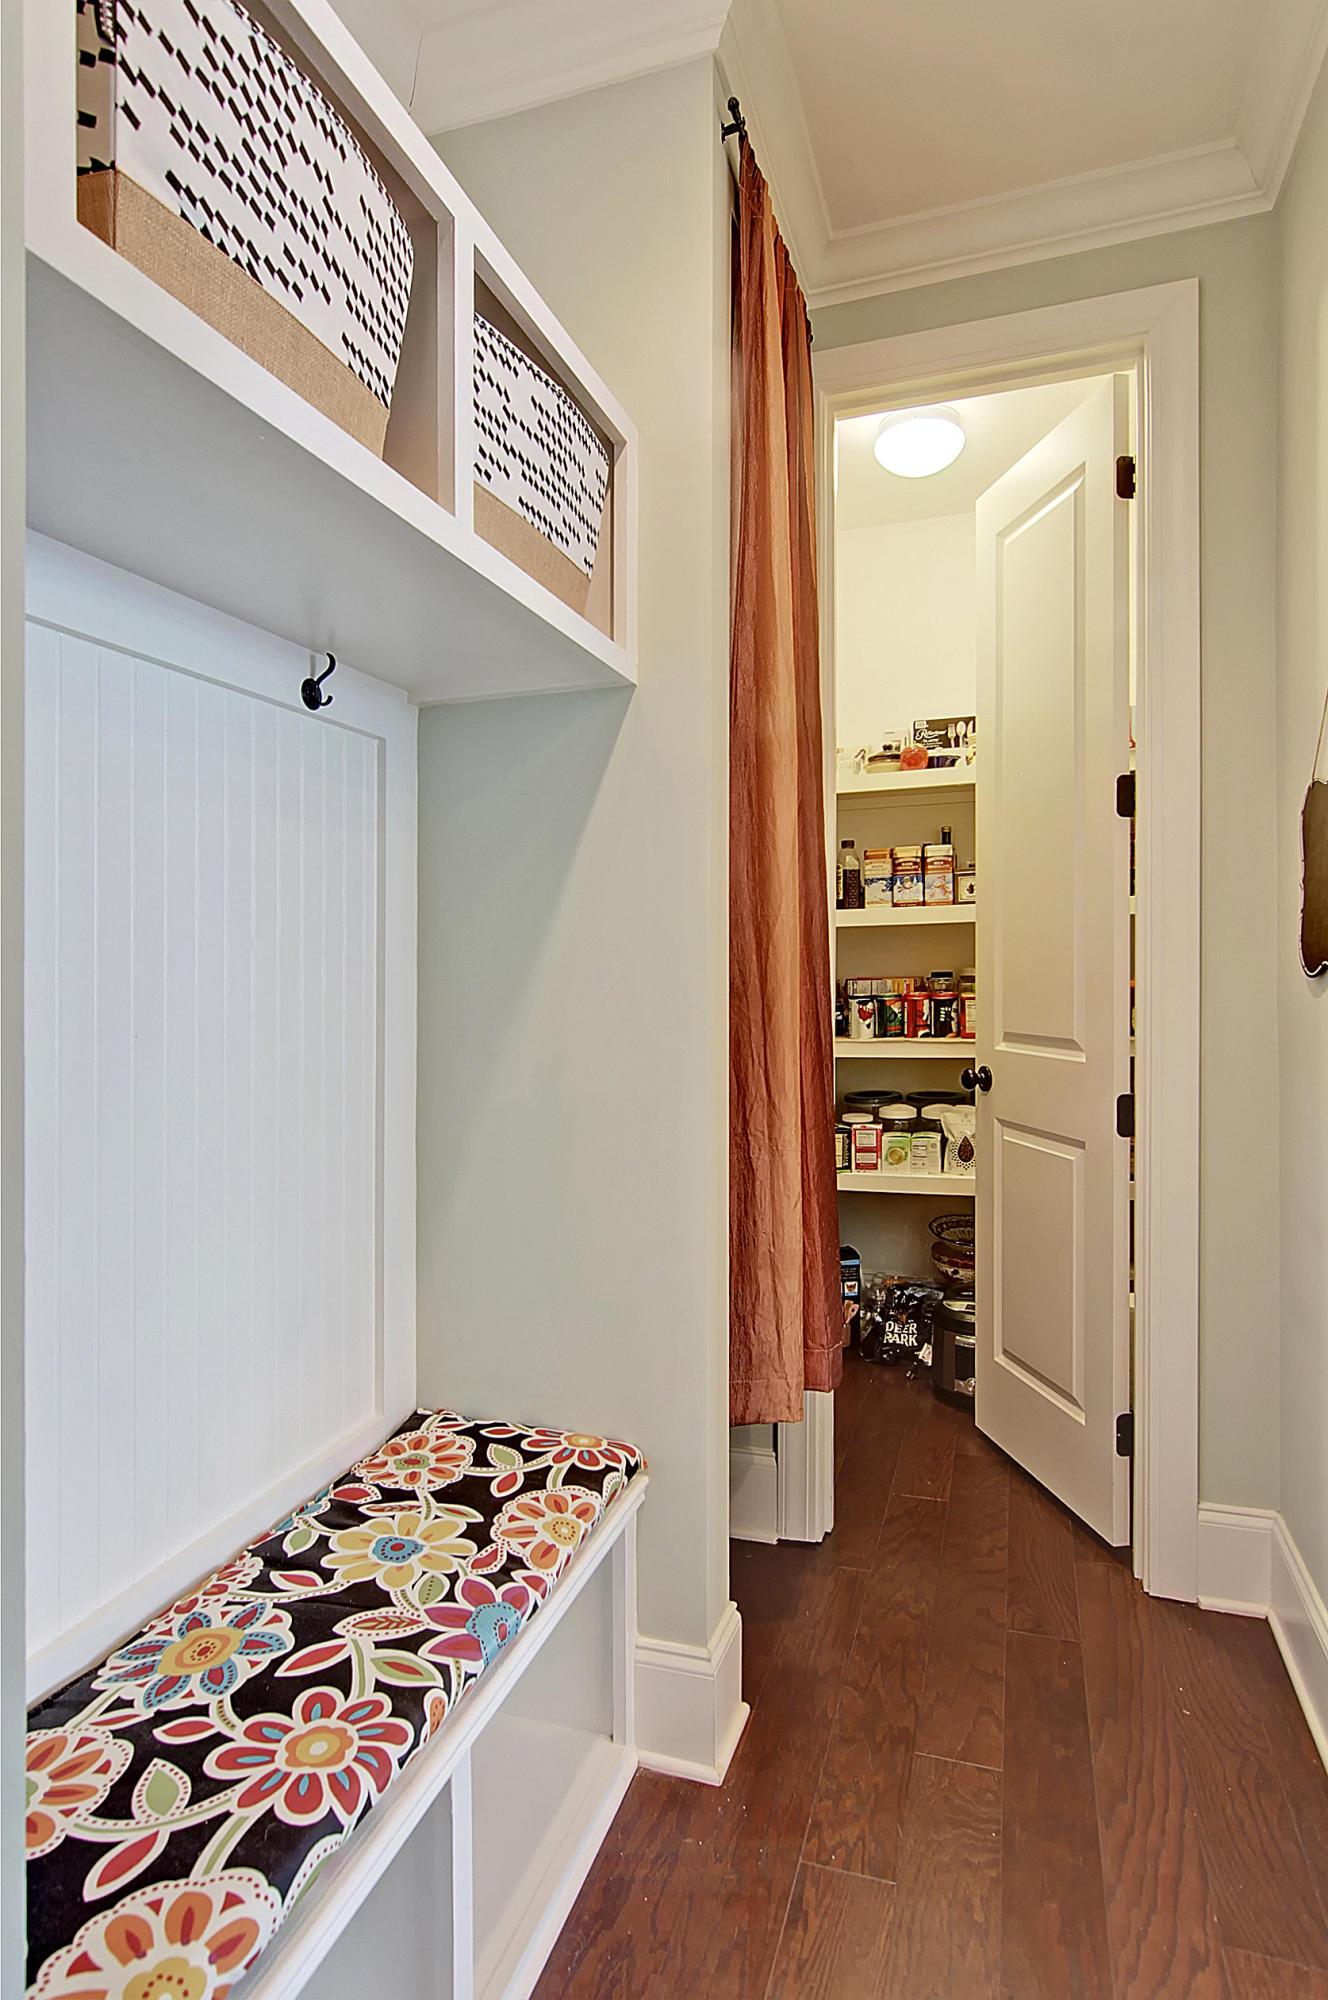 Dunes West Homes For Sale - 1332 Whisker Pole, Mount Pleasant, SC - 0